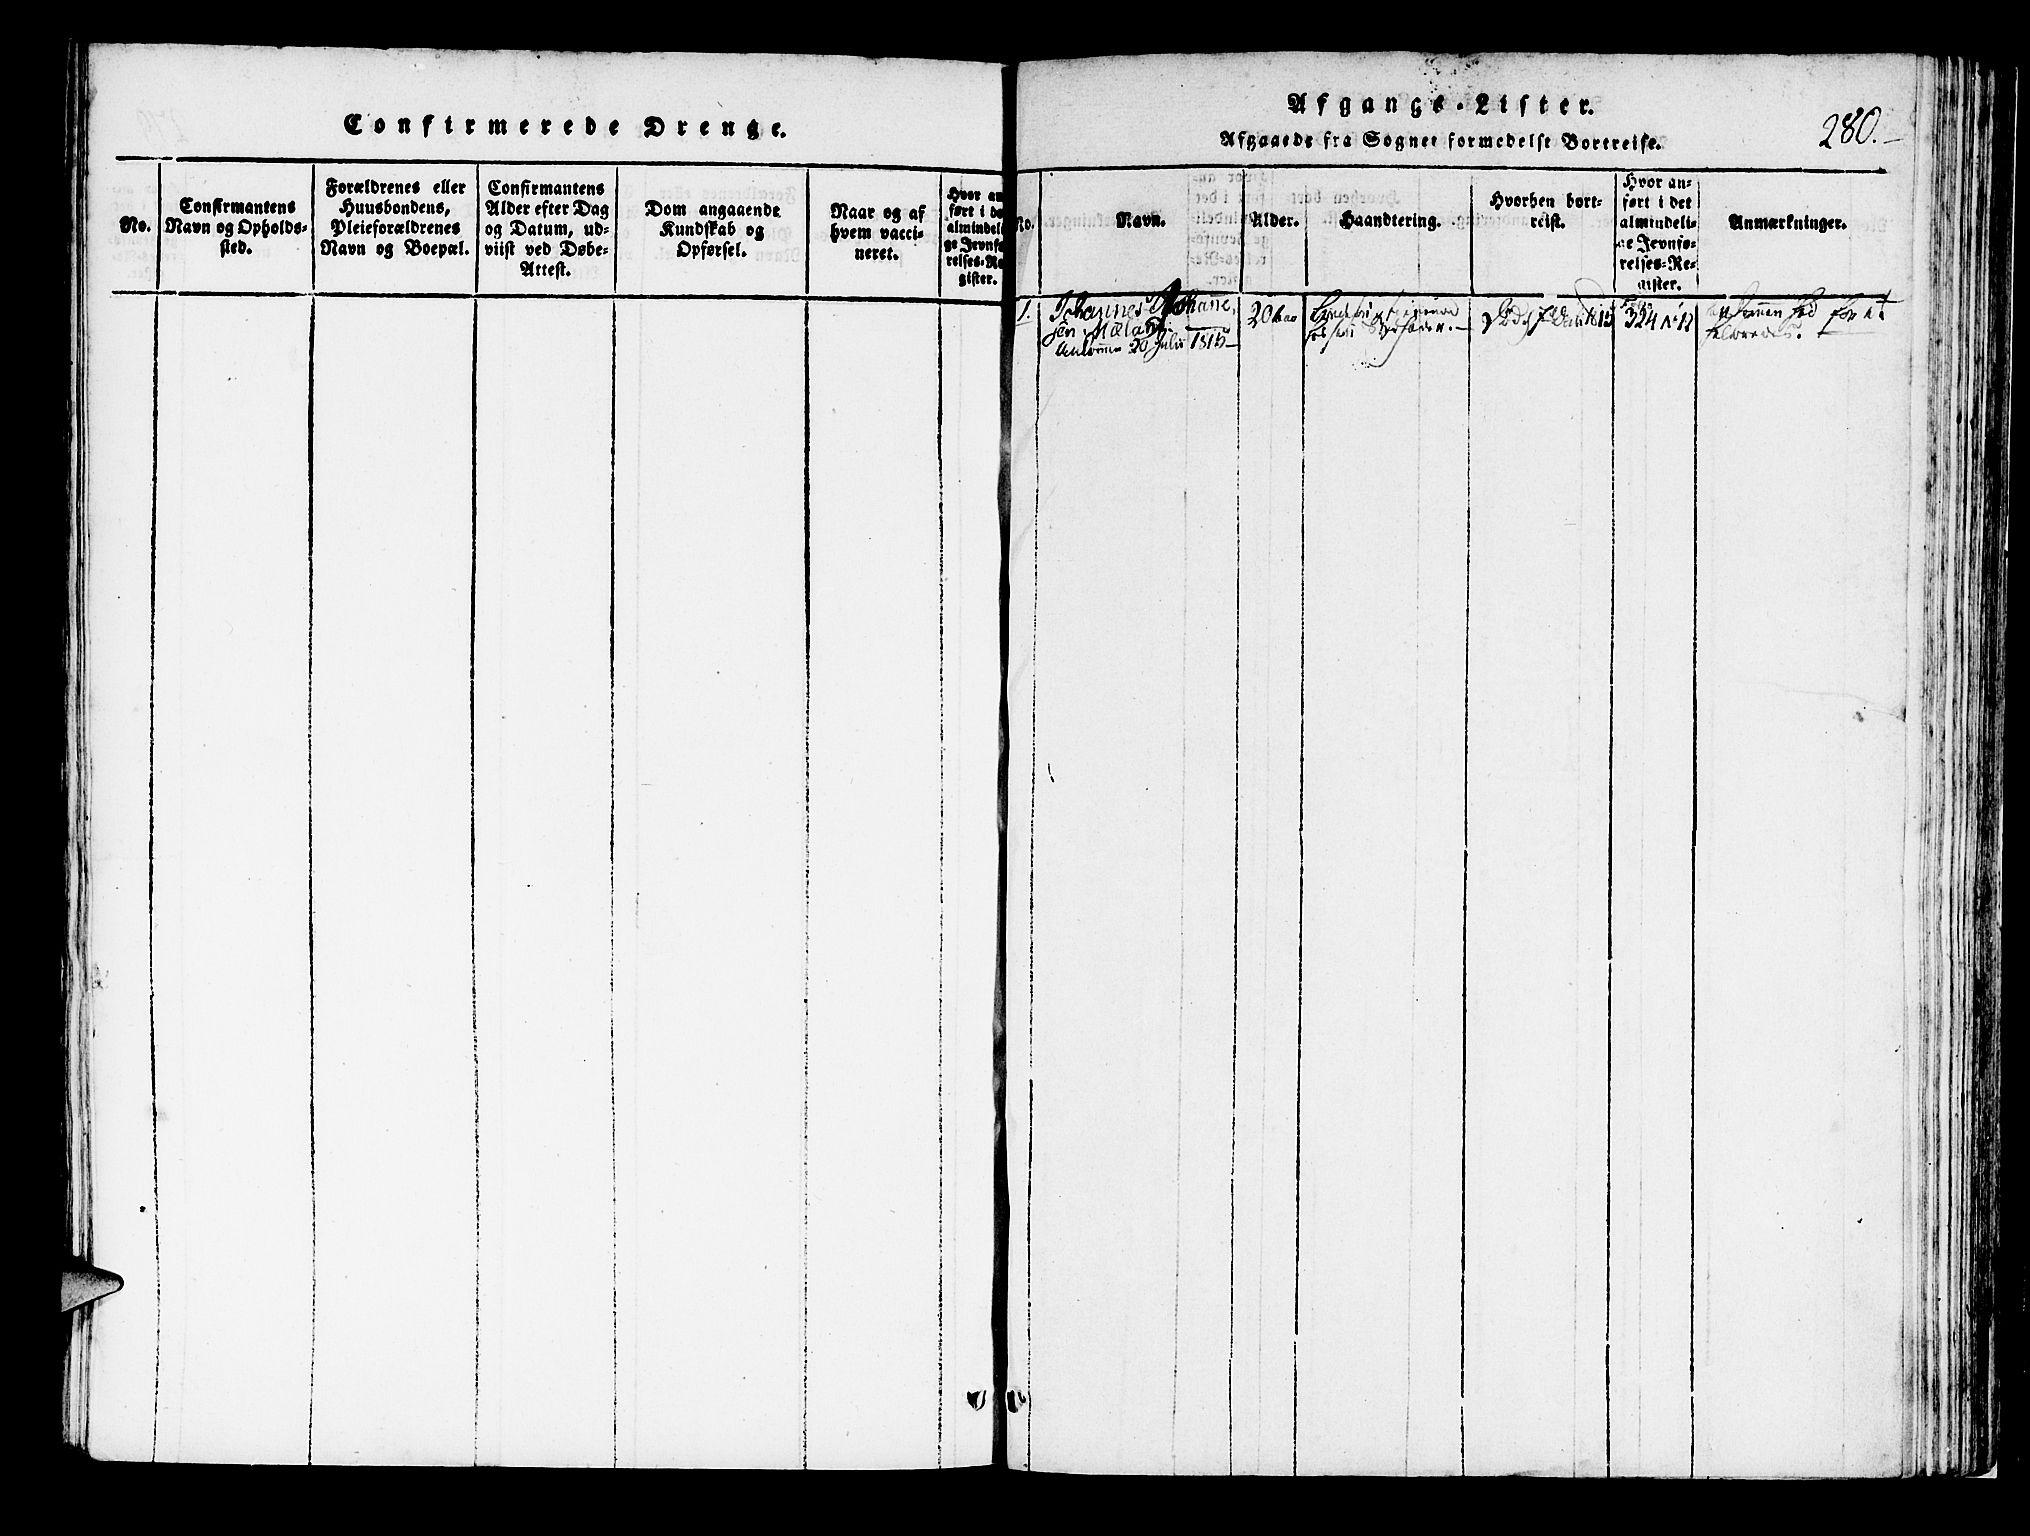 SAB, Korskirken Sokneprestembete, H/Haa/L0013: Ministerialbok nr. A 13, 1815-1822, s. 280